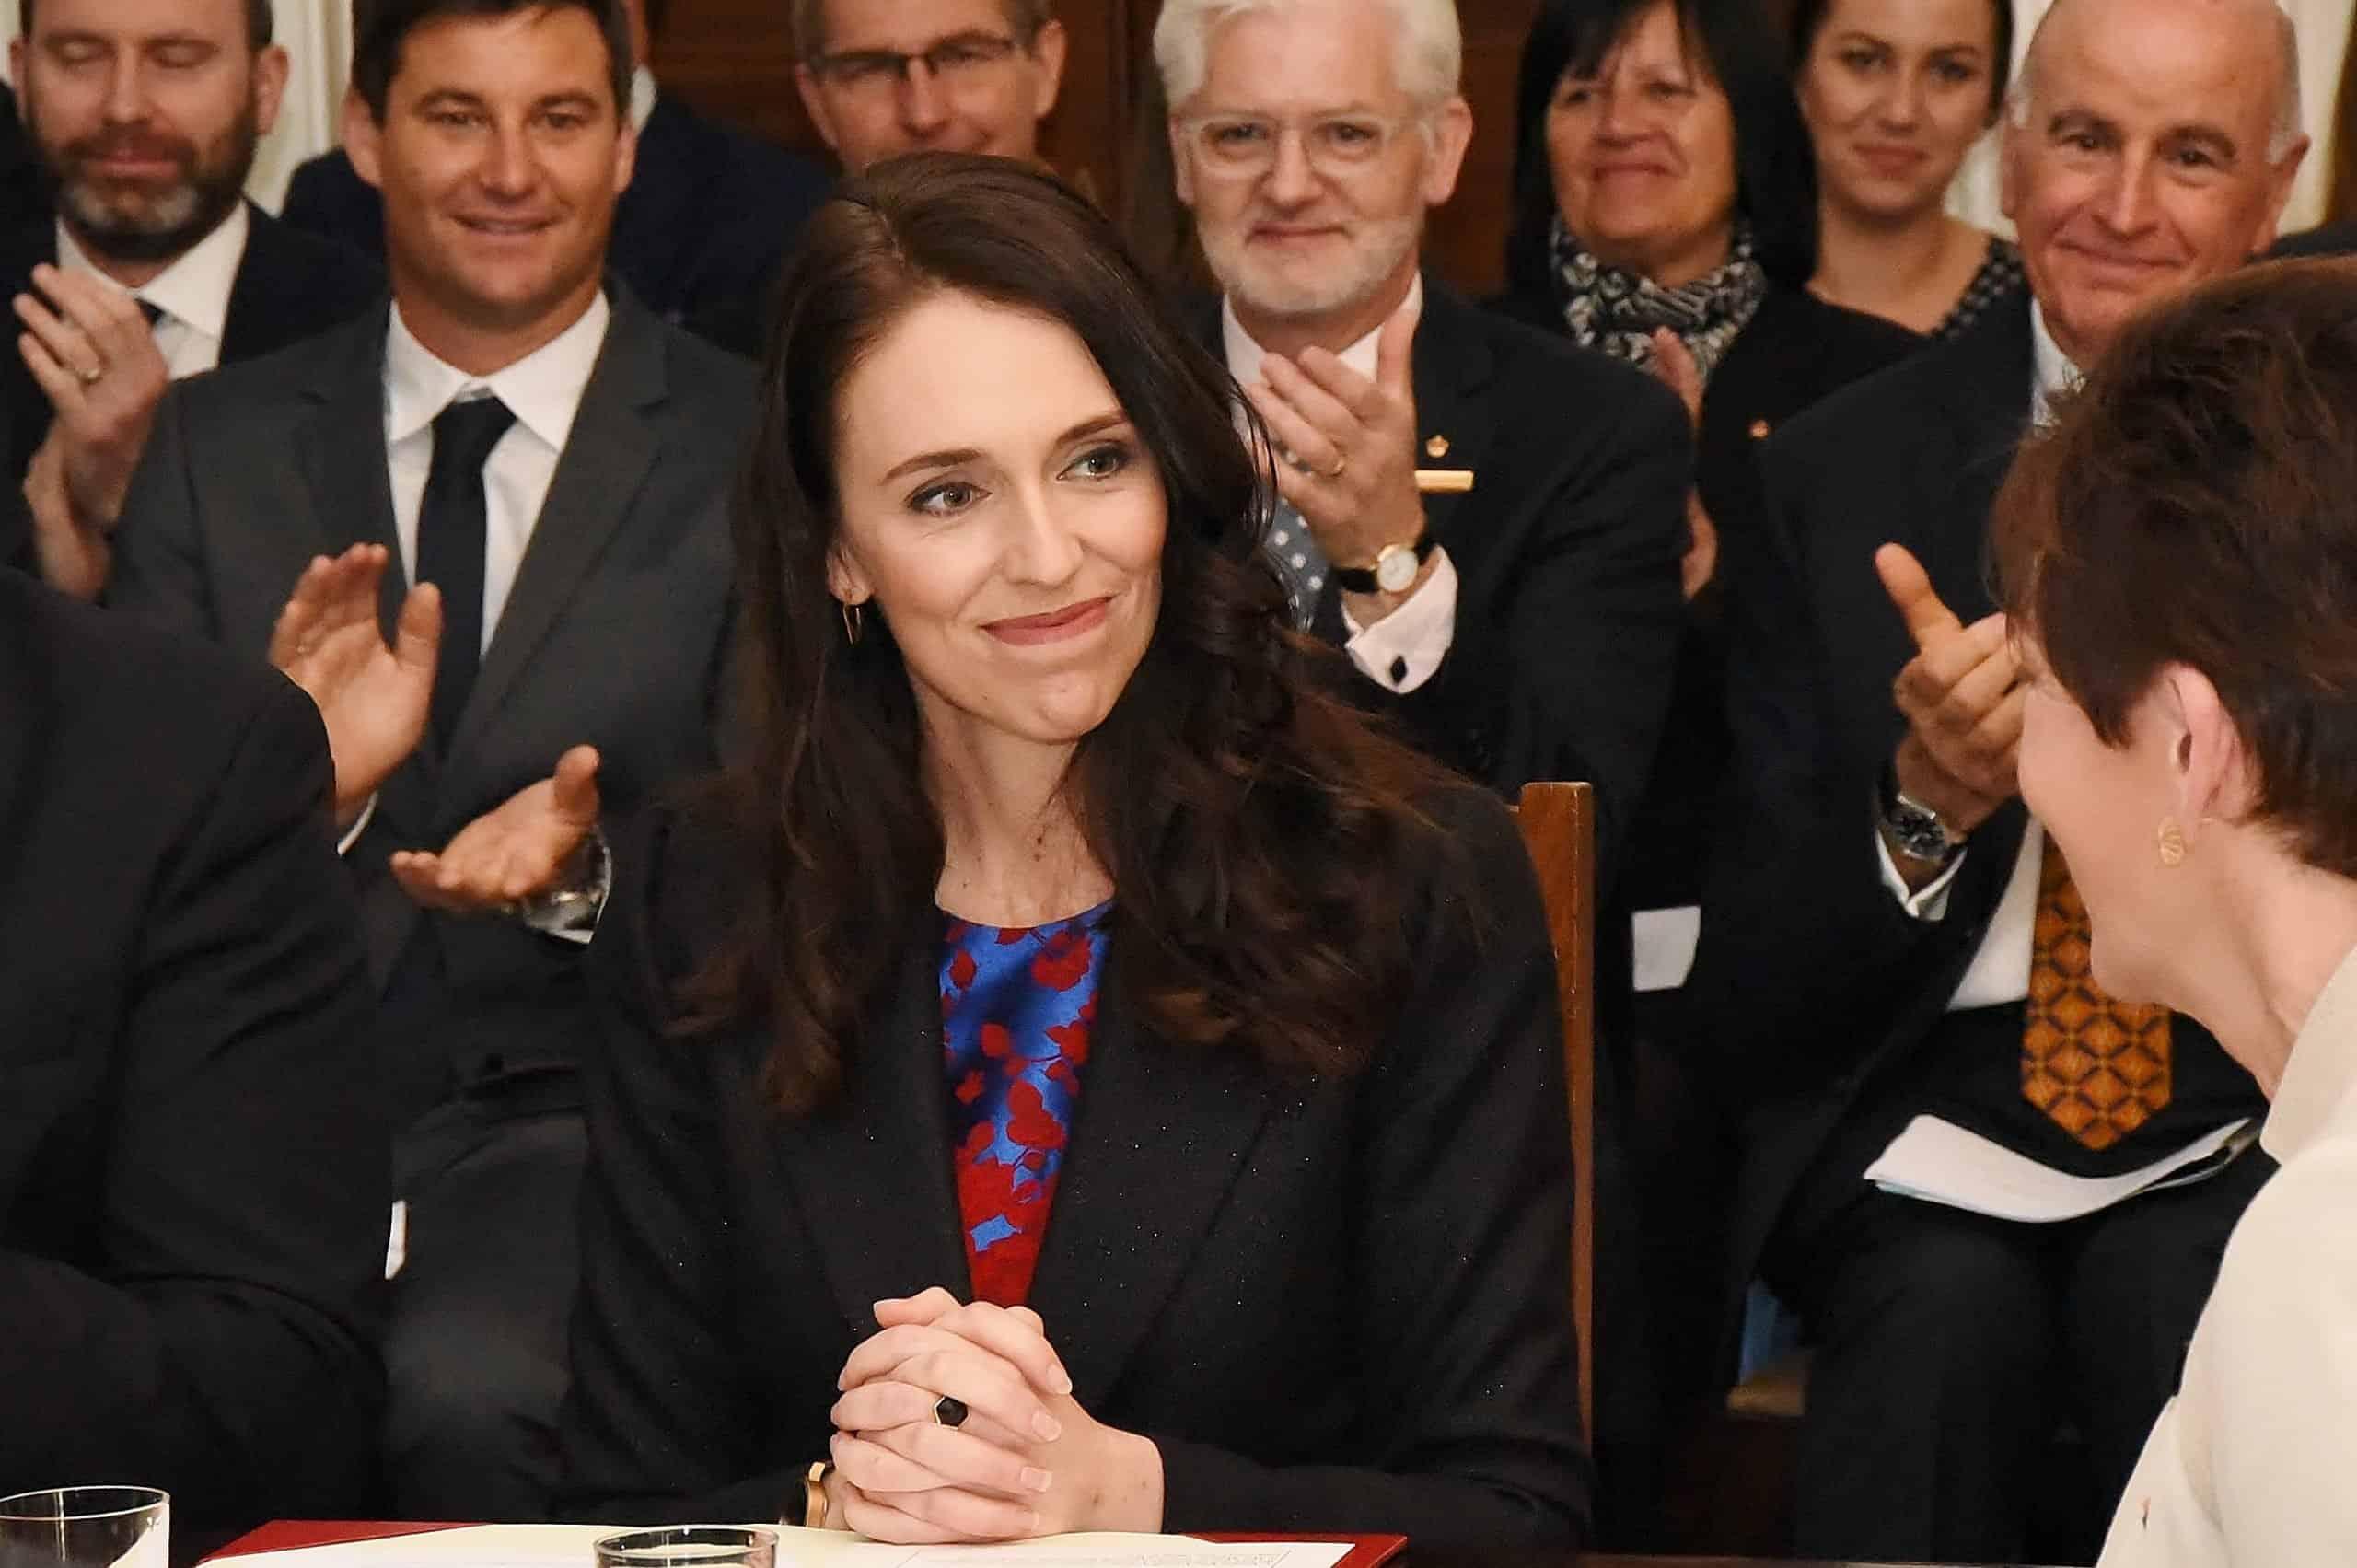 GGNZ_Swearing_of_new_Cabinet_-_Jacinda_Ardern_2